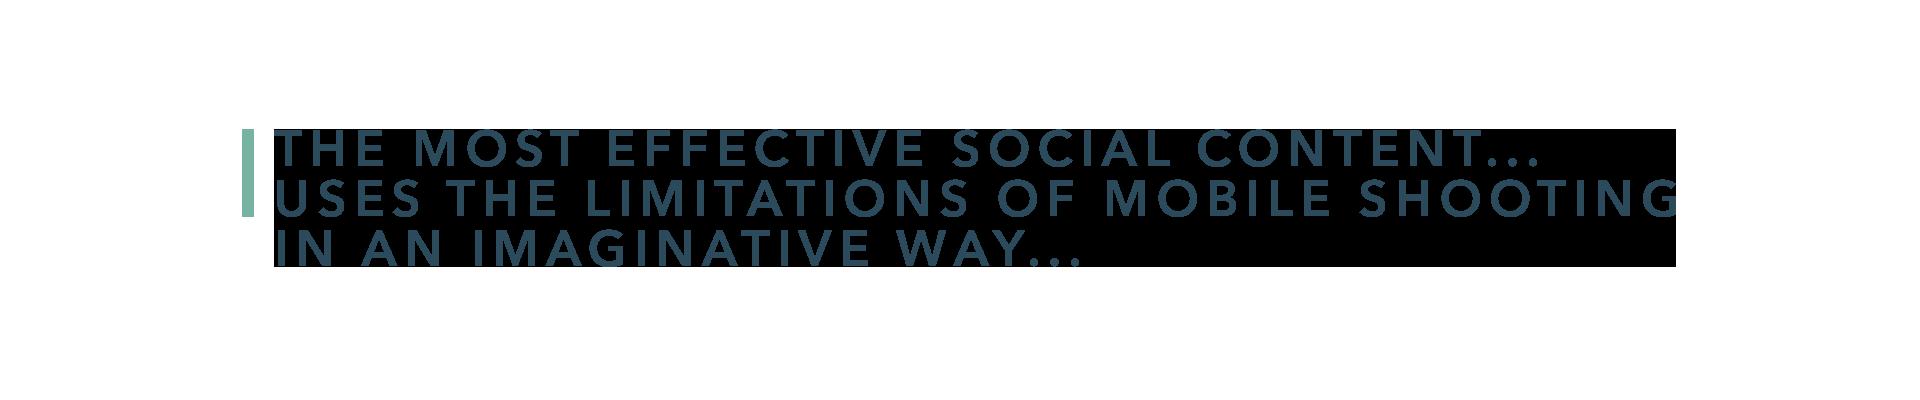 effective social content